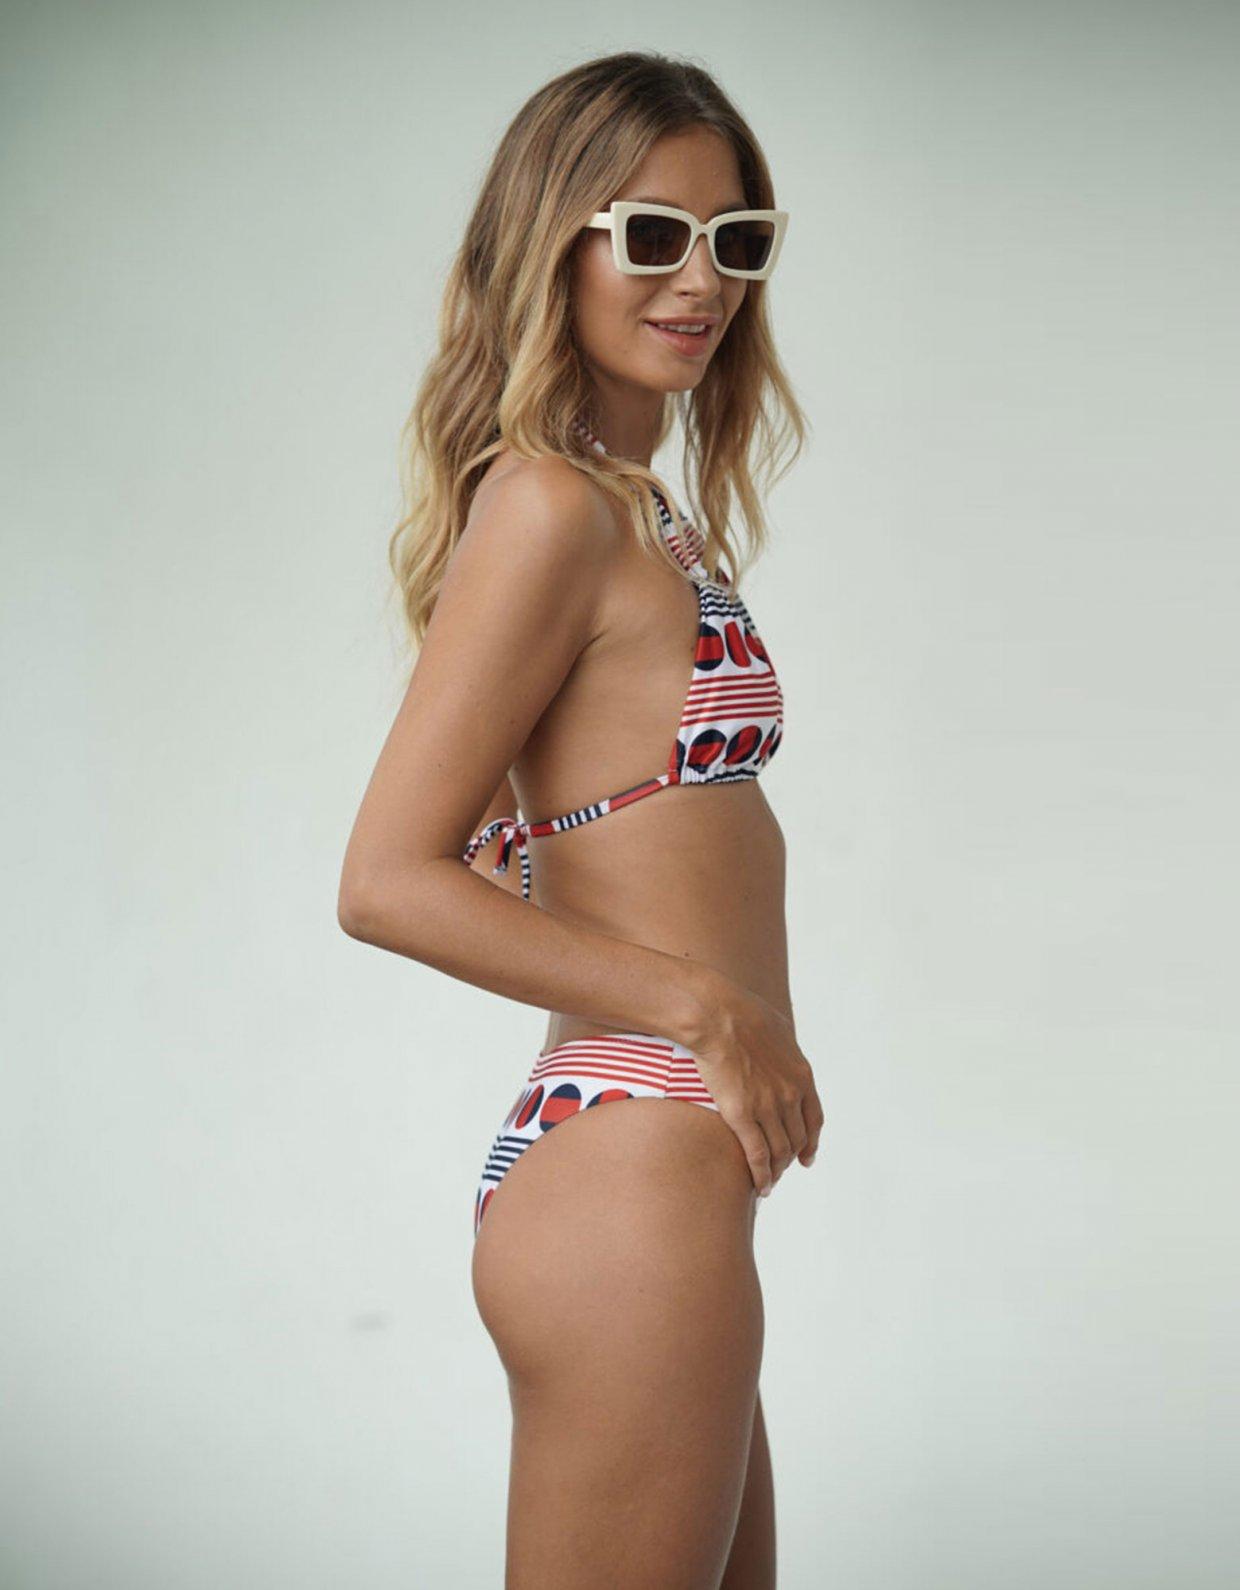 Lookseri swimwear Ayo pois n' stripes bikini